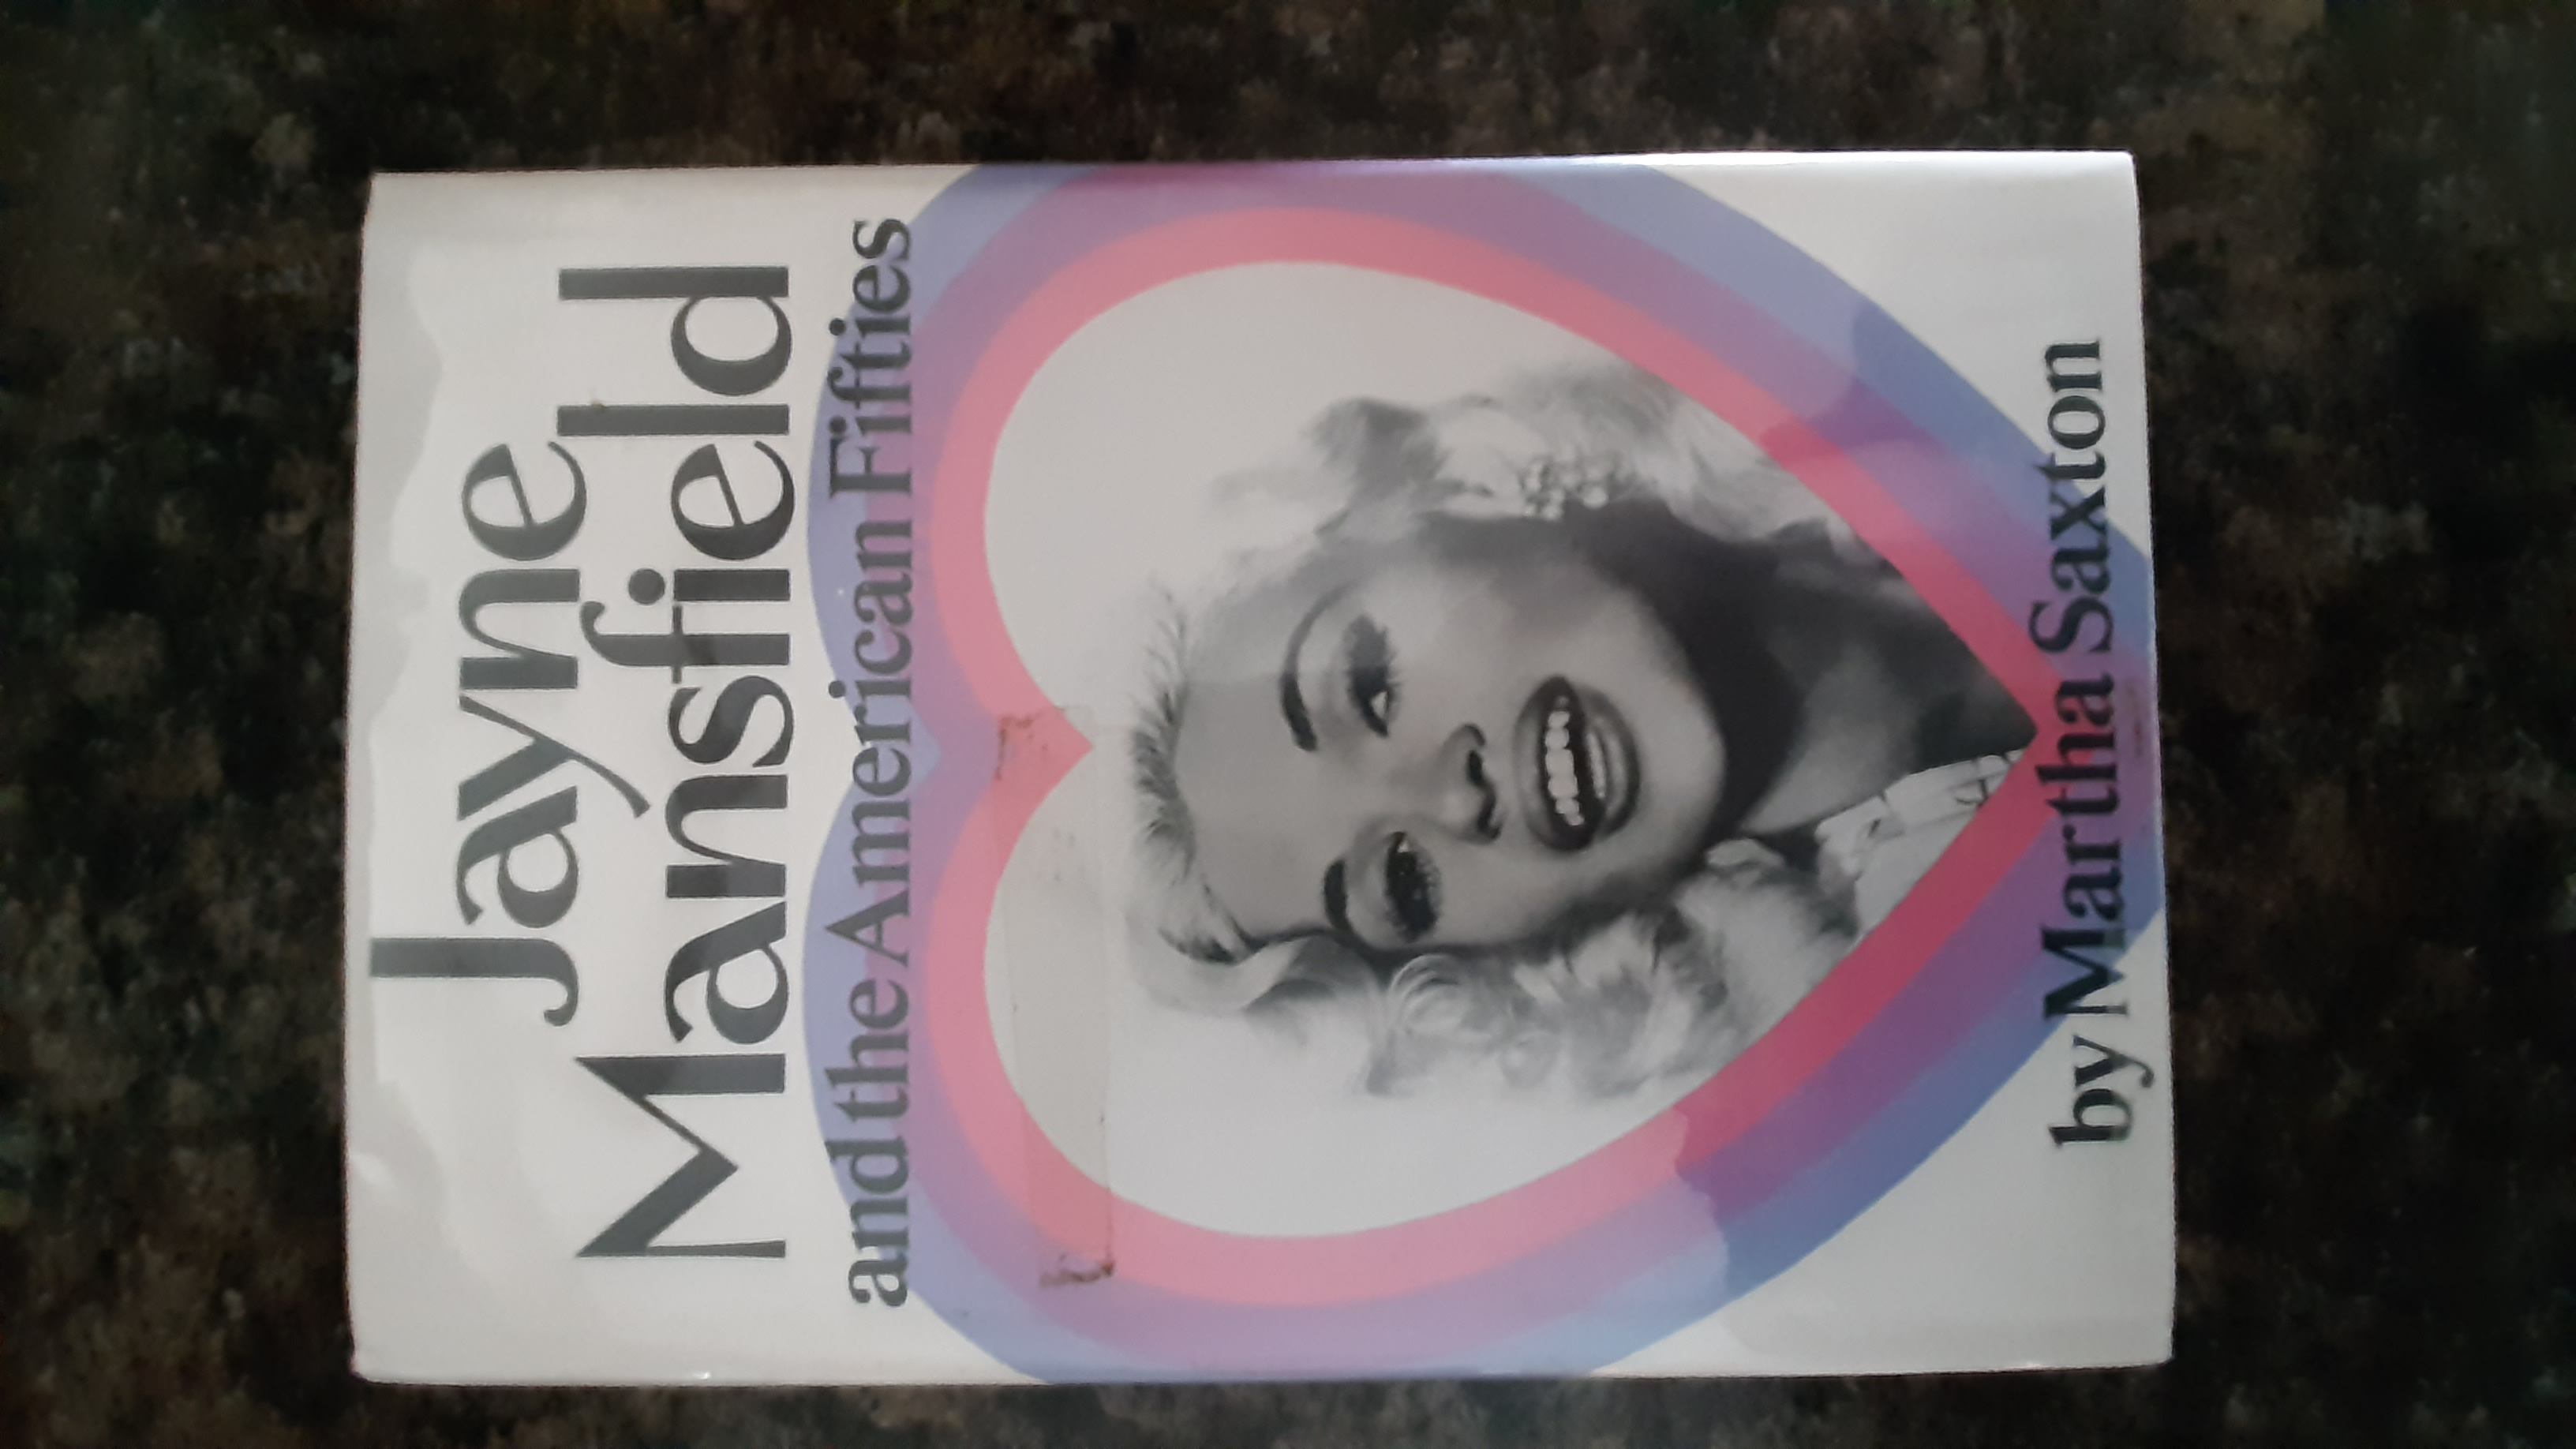 Jayne Mansfield and the American fifties - Saxton, Martha